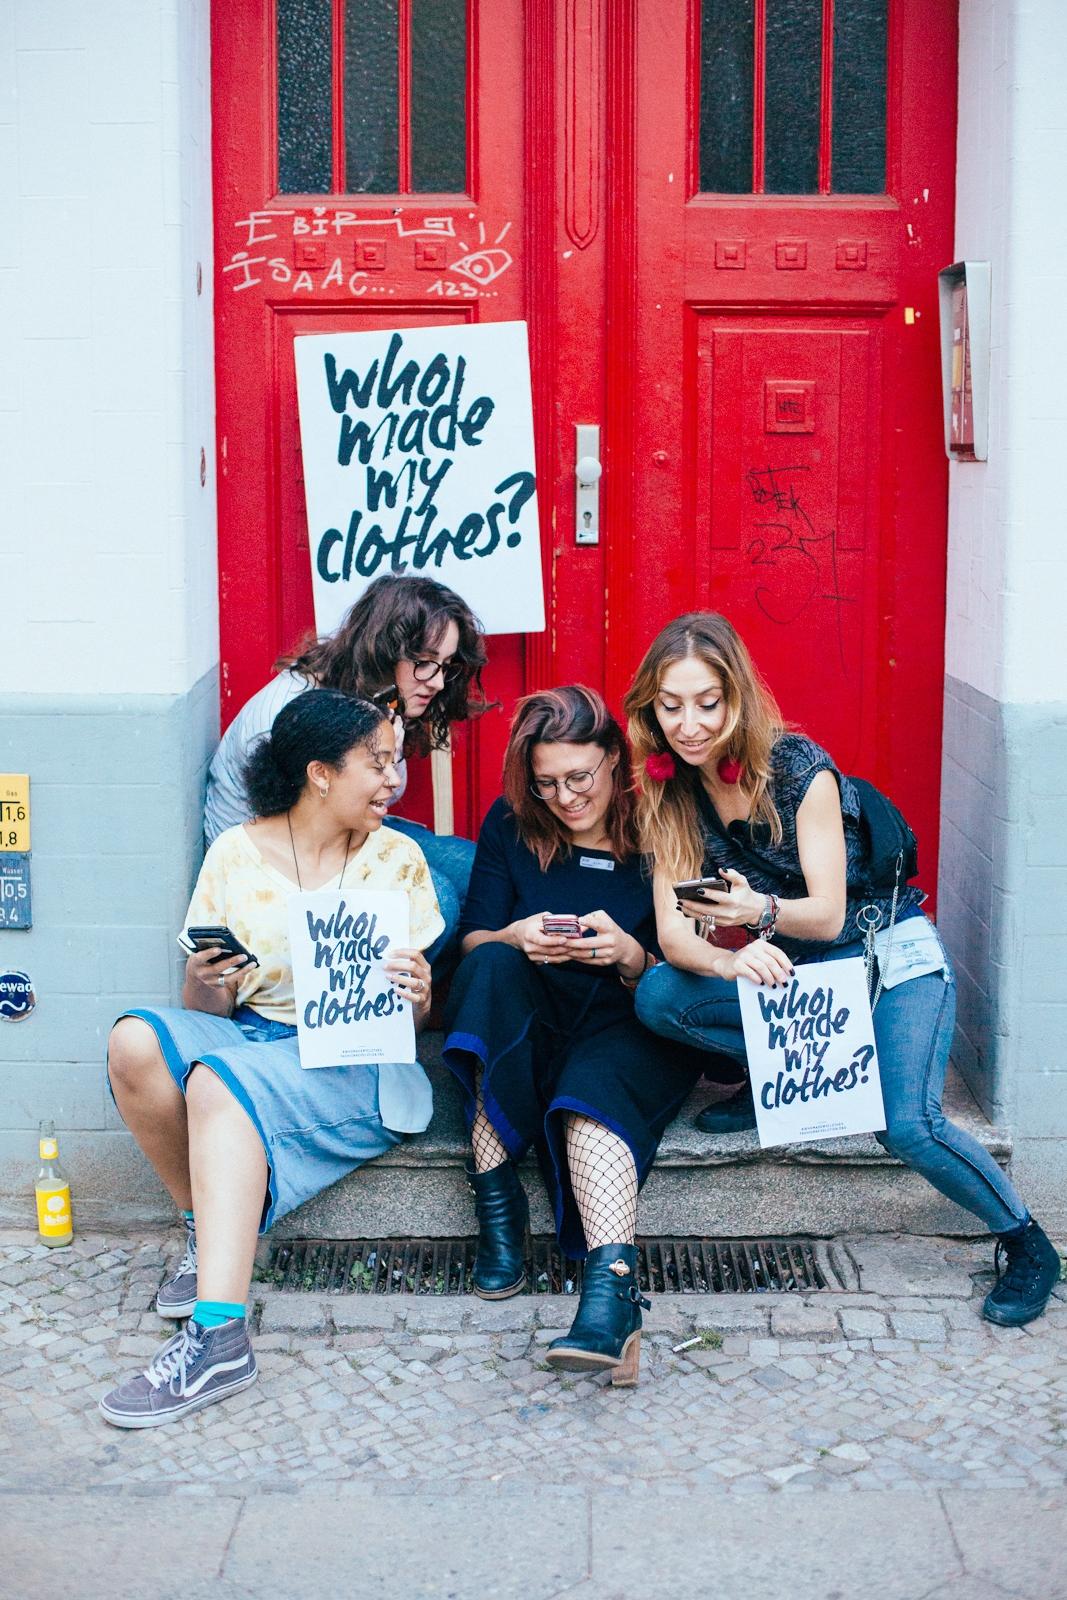 L -> R: Cherelle Abram (Facebook), Lisa Reannan (Facebook), Nora Milena Vehling (Twitter and general coordination), Mariángeles Aguirre (Instagram) / ©️Cherie Birkner